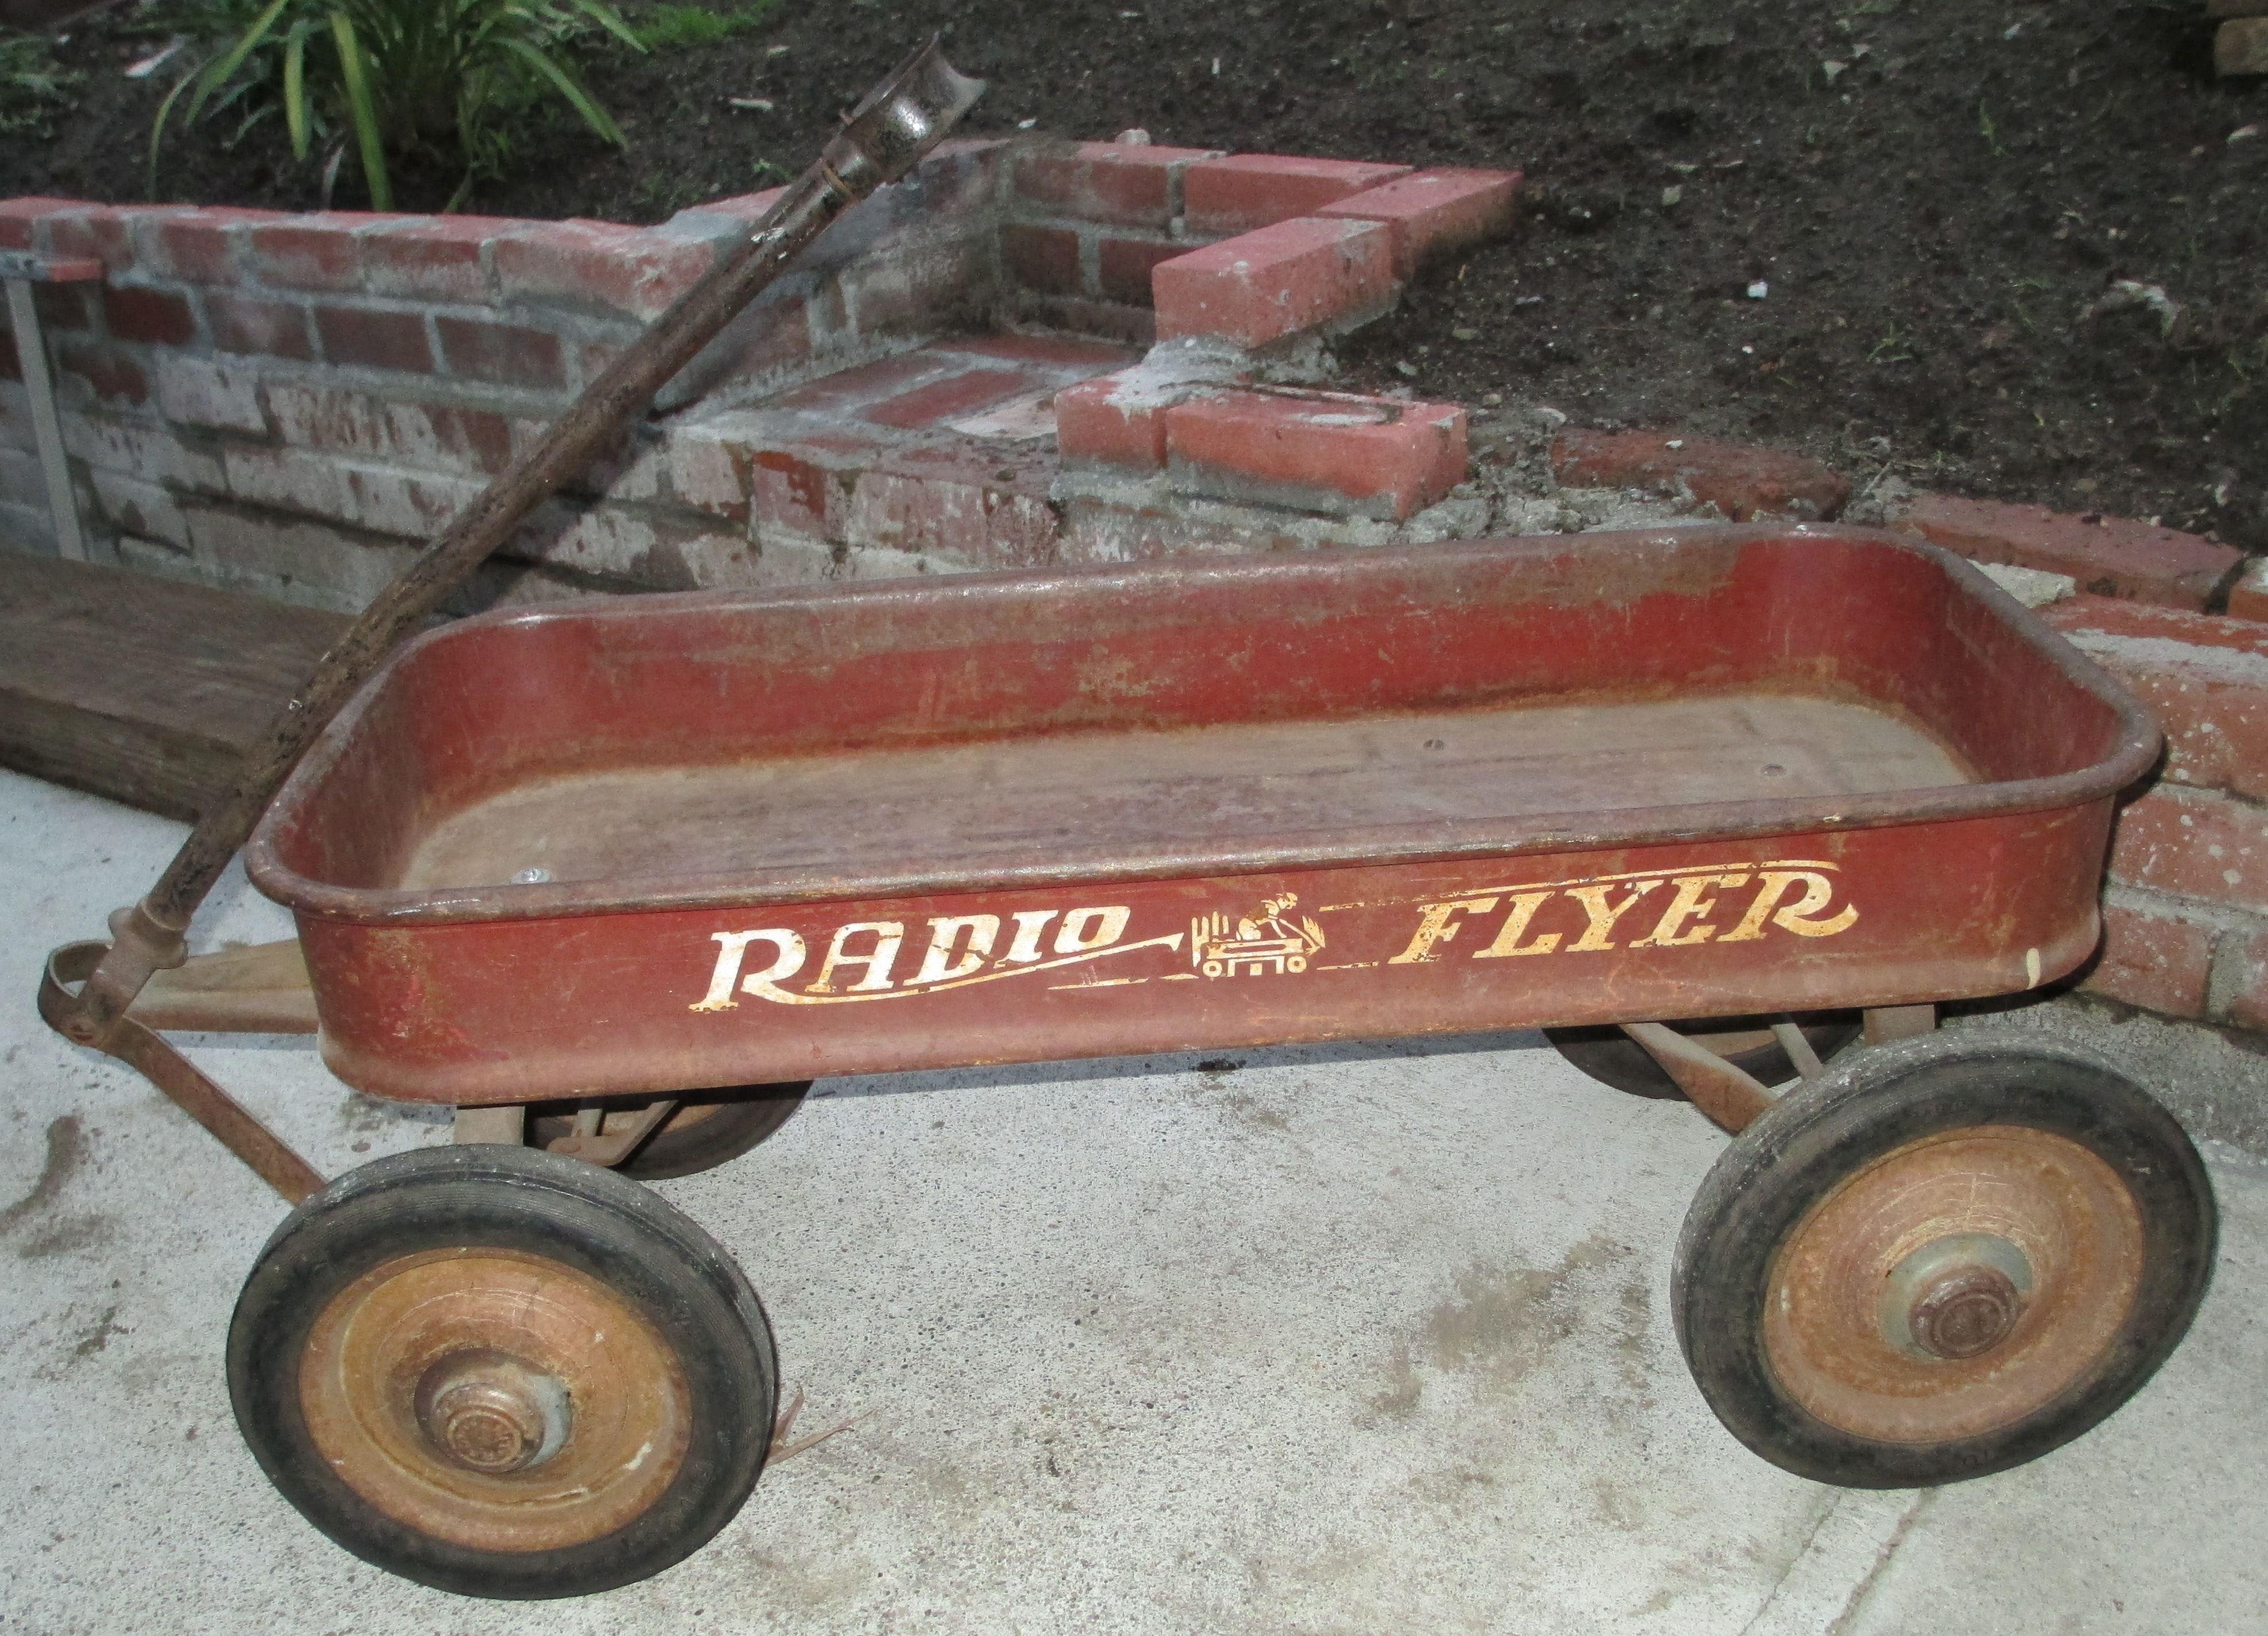 Vintage Radio Flyer Painting Google Search Radio Flyer Wagons Radio Flyer Kids Wagon